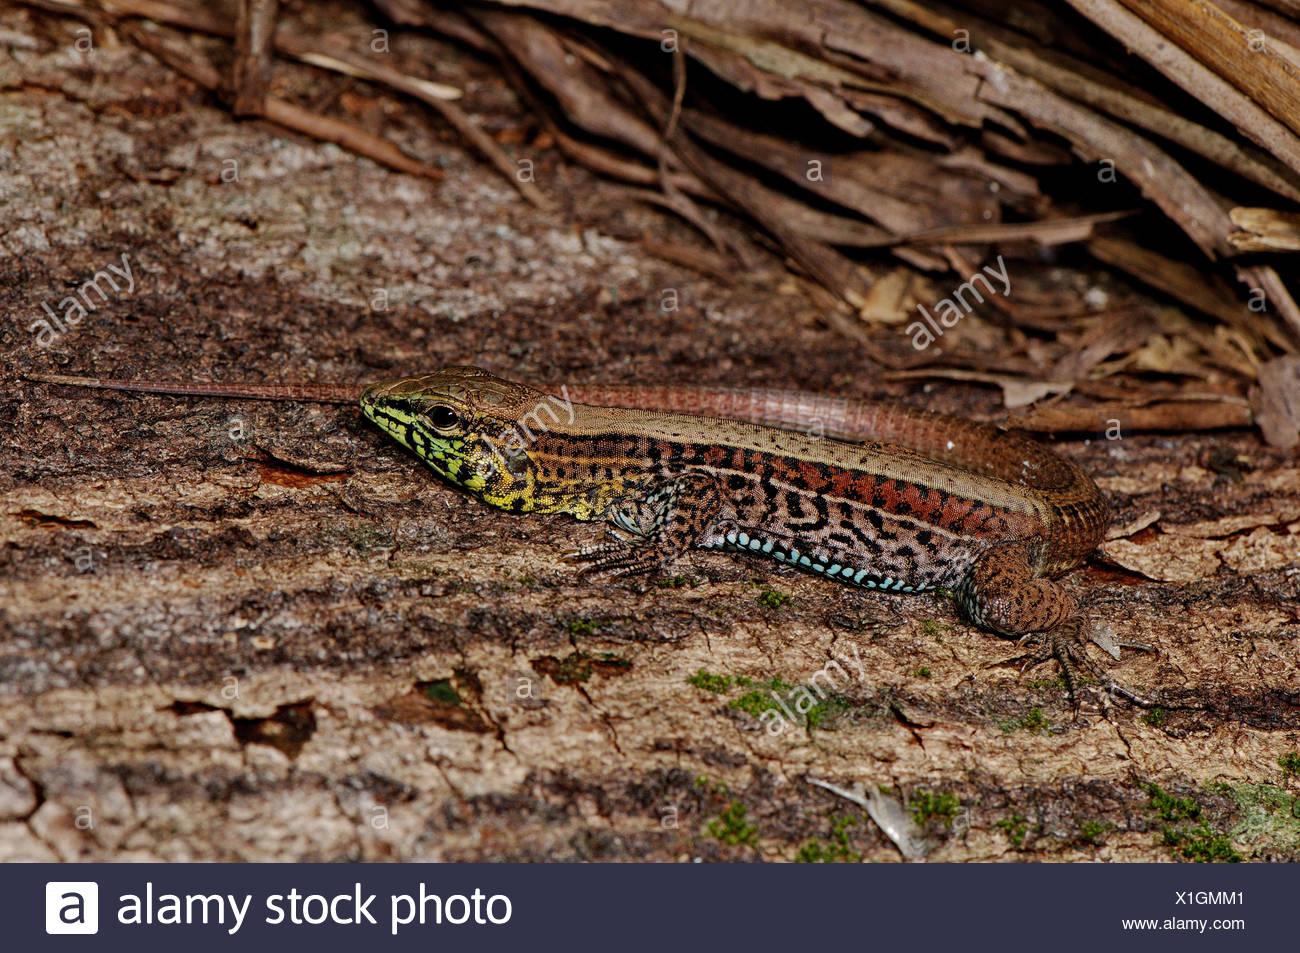 Ameiva Lizard Stockfotos & Ameiva Lizard Bilder - Alamy